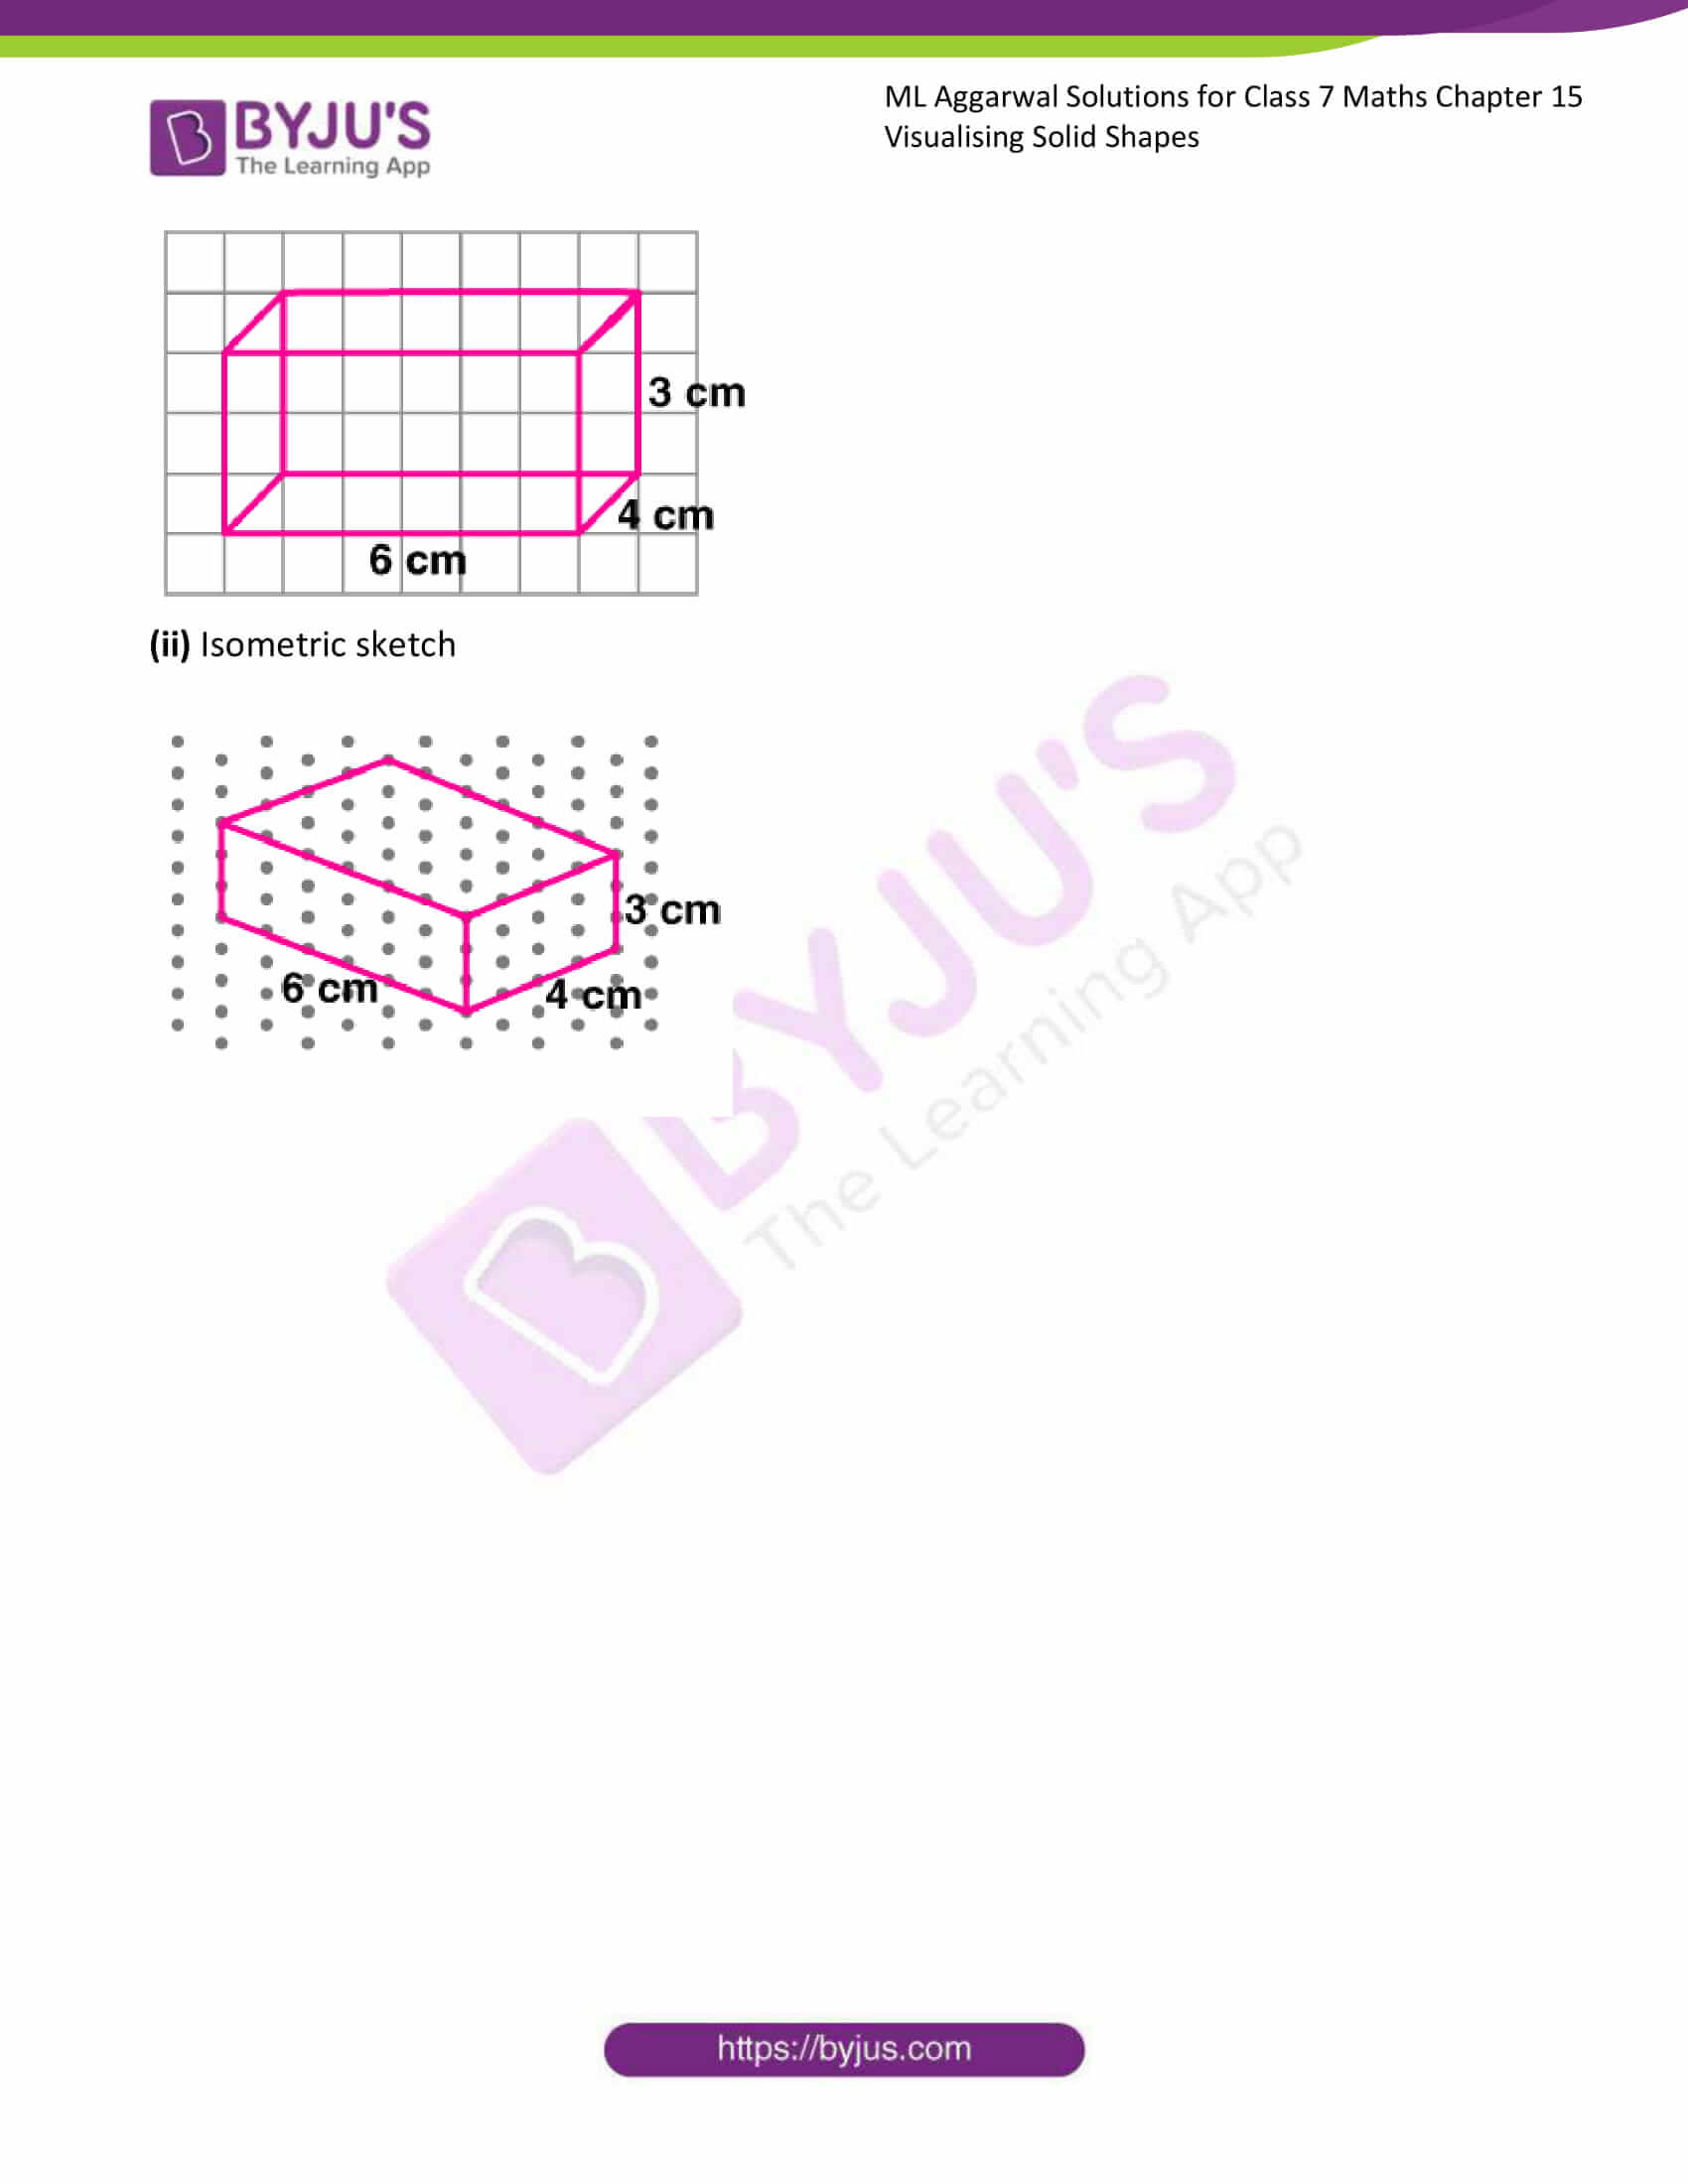 ml aggarwal sol class 7 maths chapter 15 11